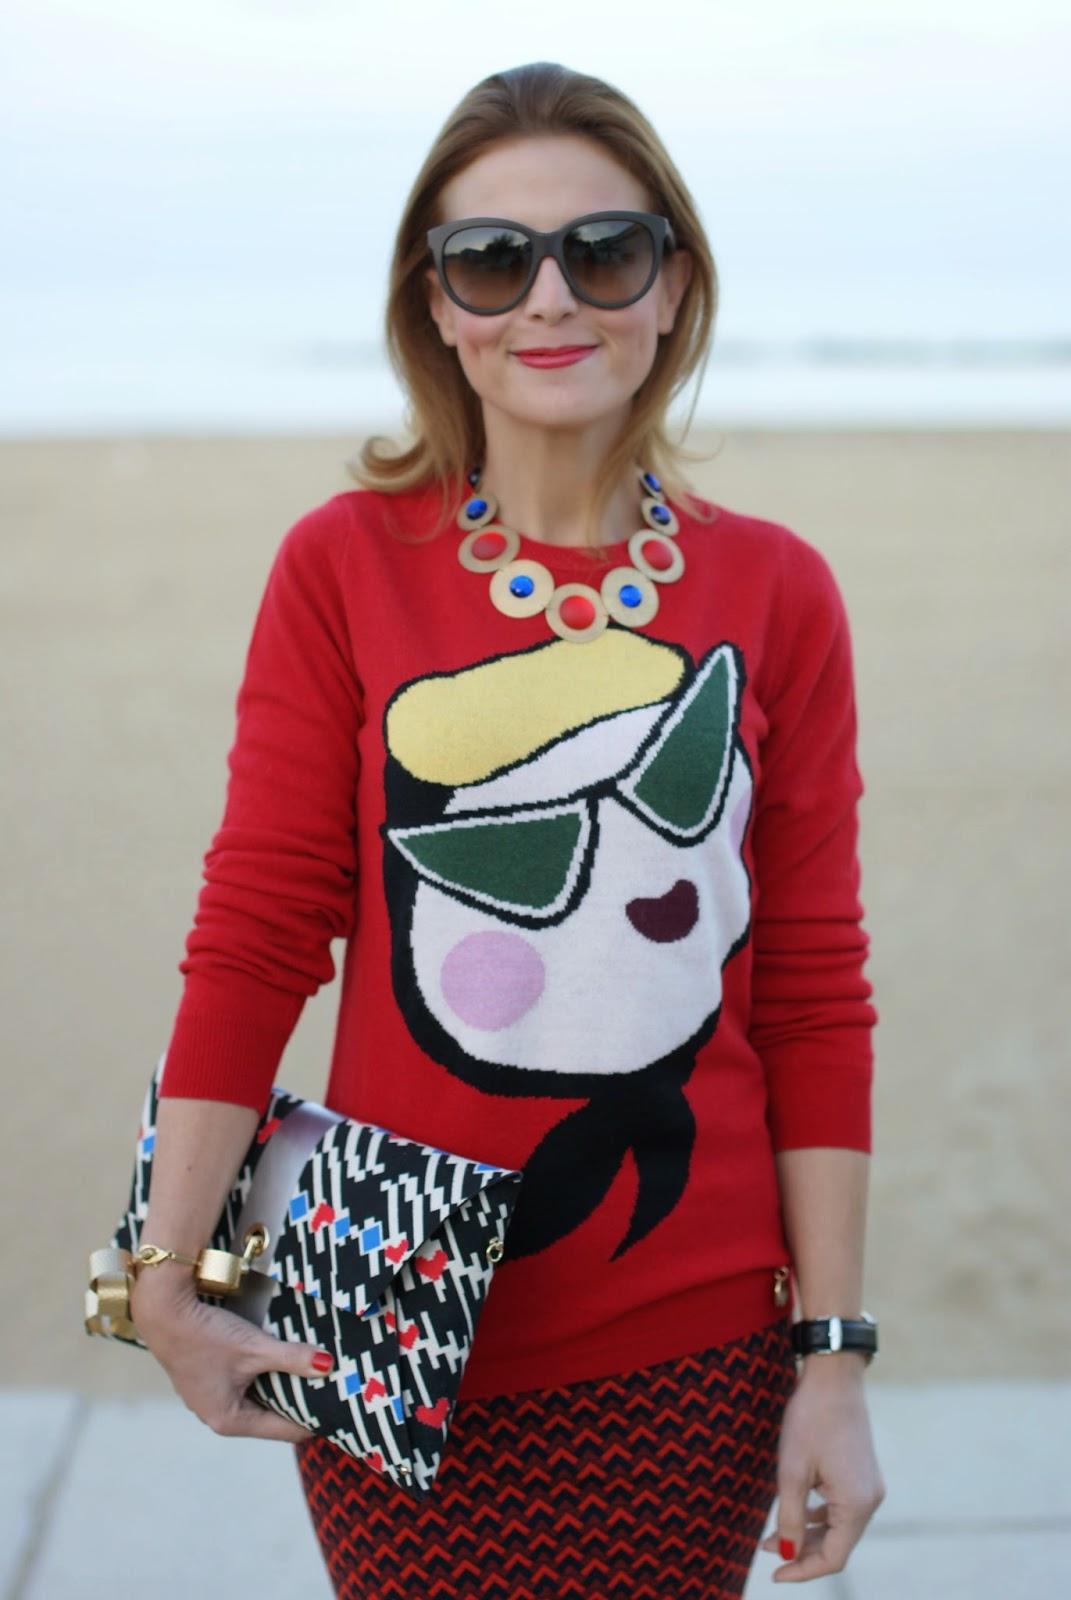 76ad28b18b Love Moschino sweater Vitti Ferria Contin necklace and bracelet Pull Bear  skirt Dolce   Gabbana sunglasses Nando Muzi pumps Ohmai clutch